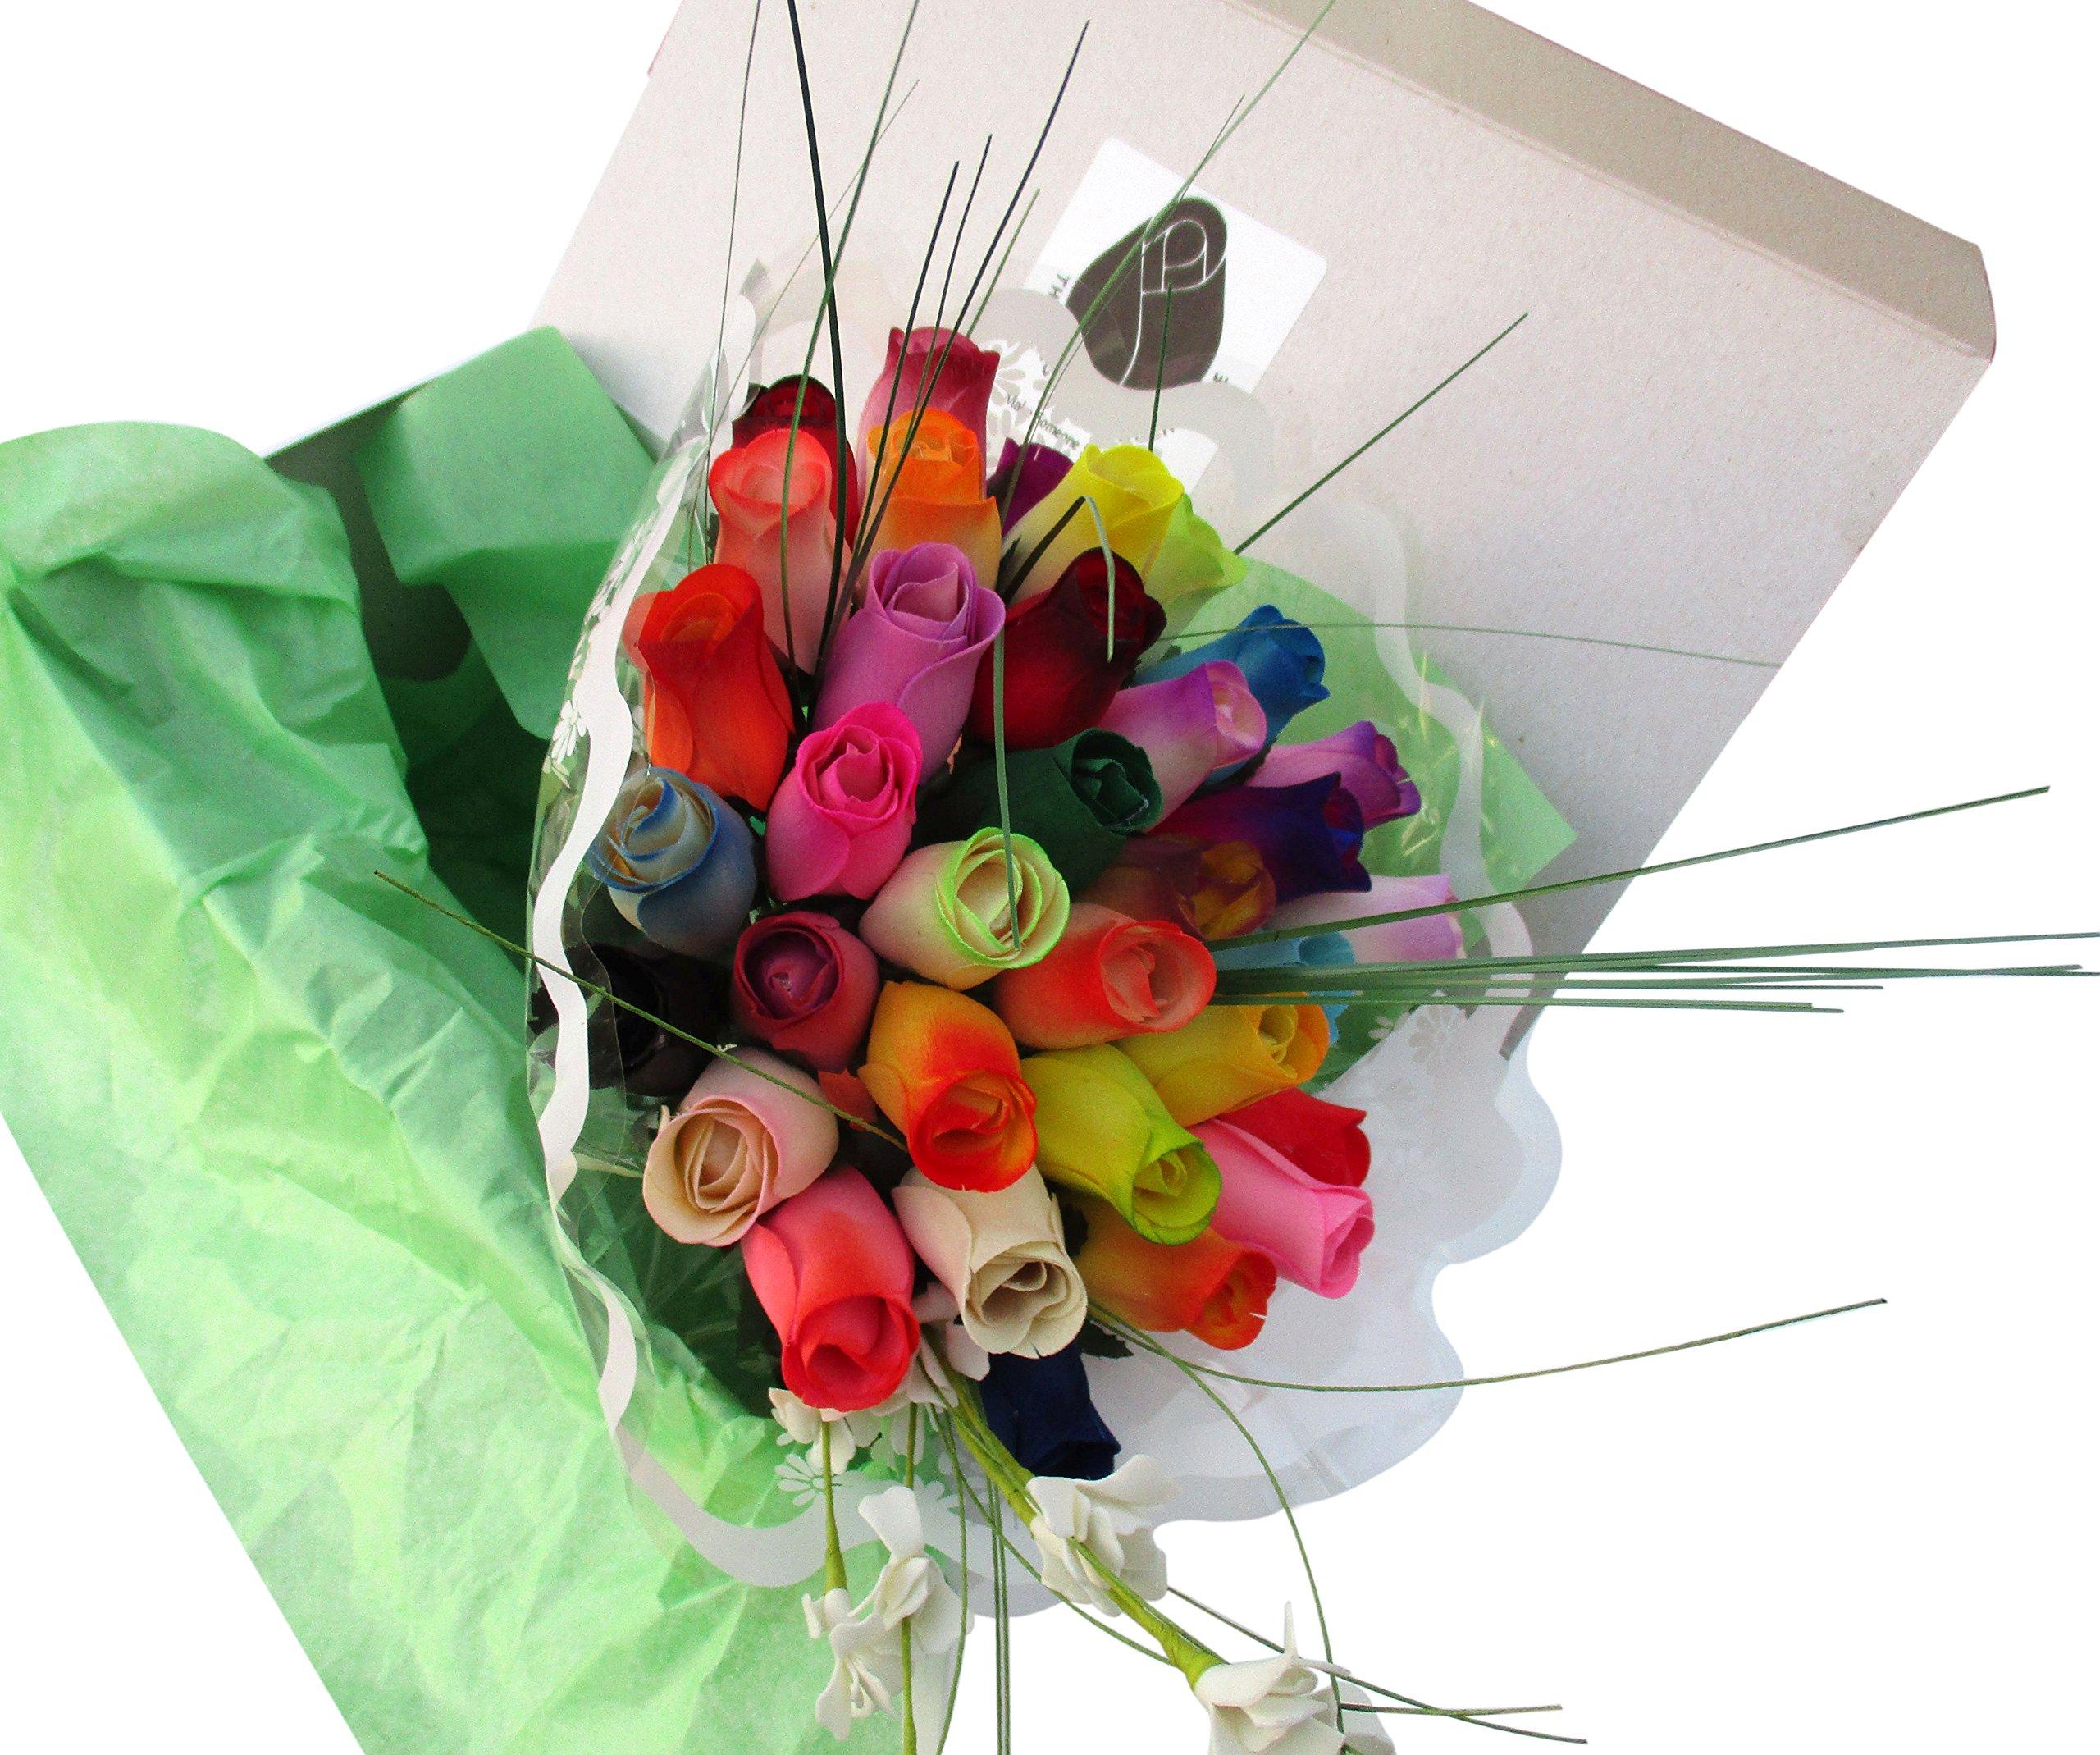 The Original Wooden Rose Assorted Colors Floral Flower Bouquets in a Gift Box (3 Dozen Bouquet) …